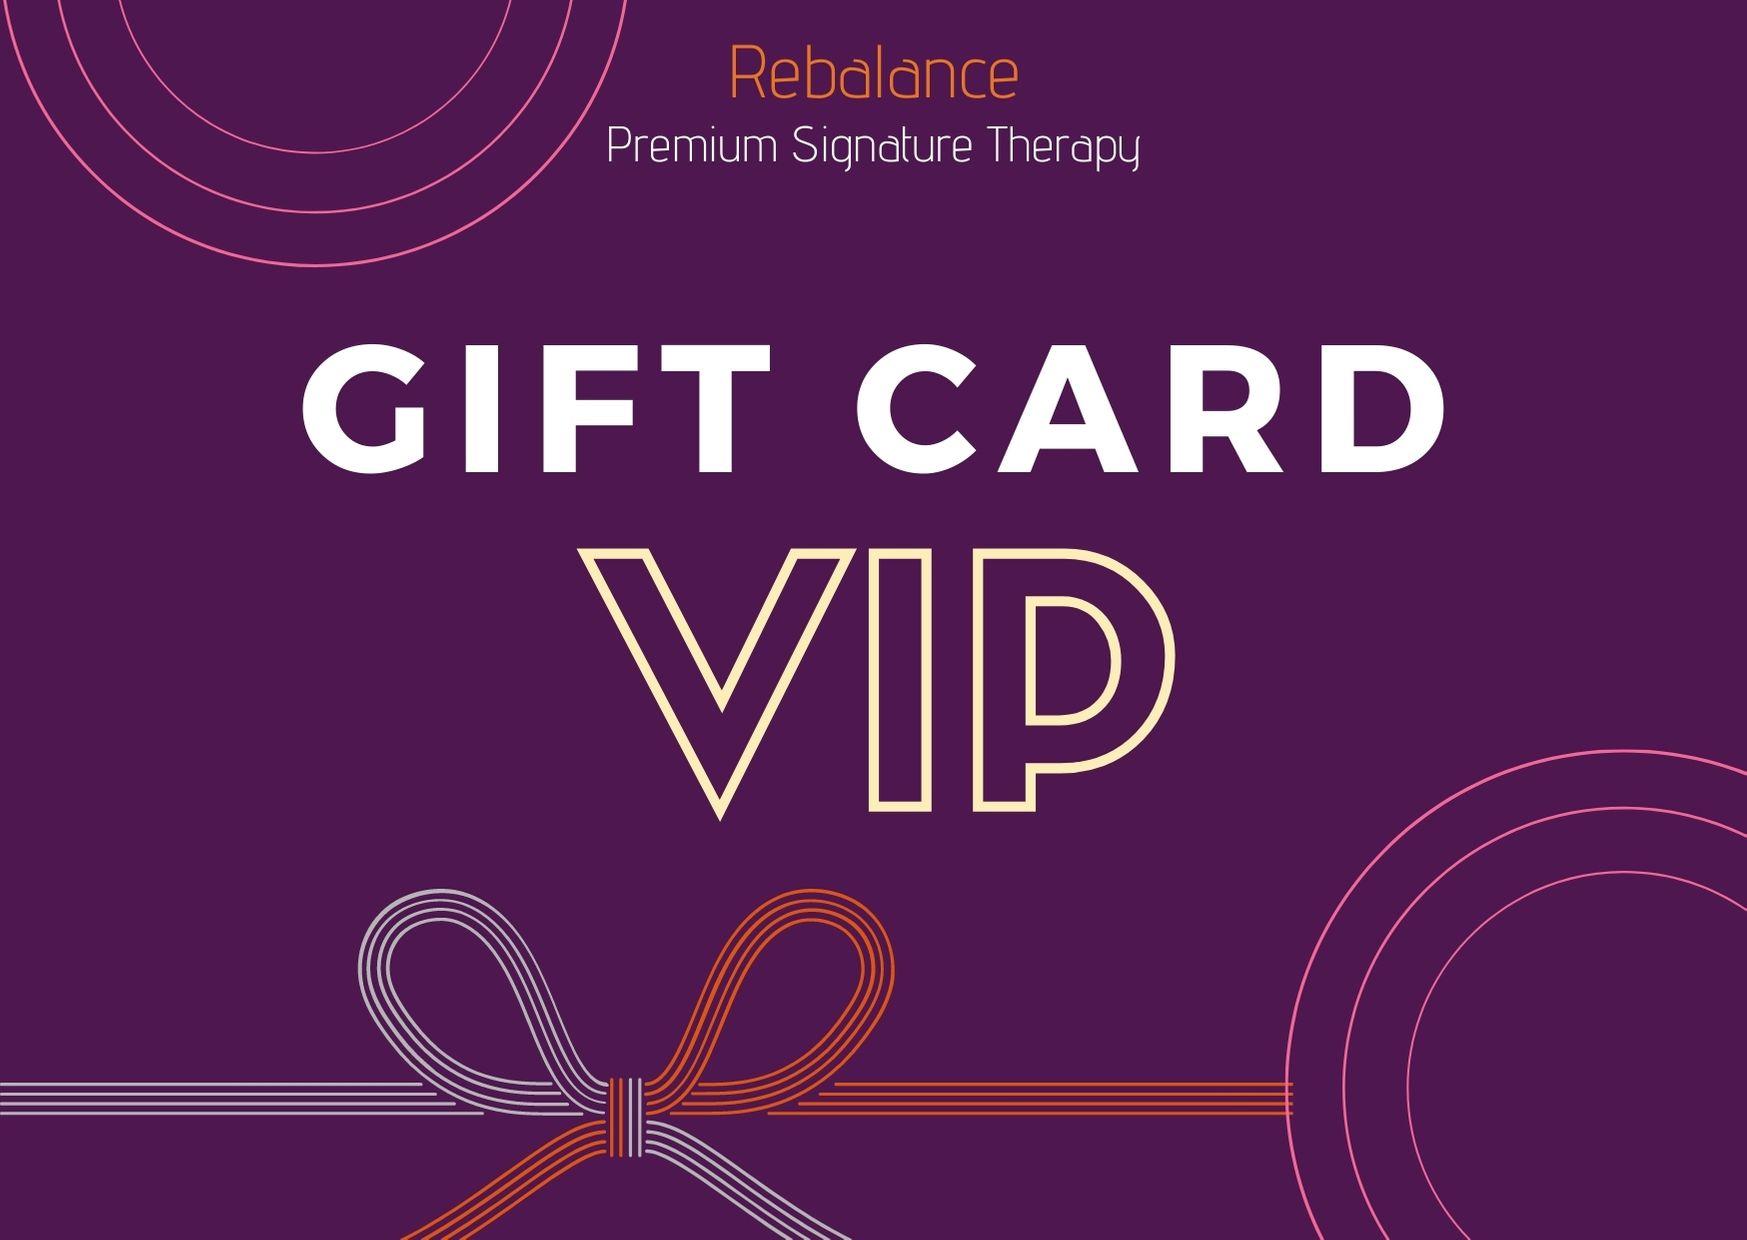 GIFT CARD - VIP- ReBalance